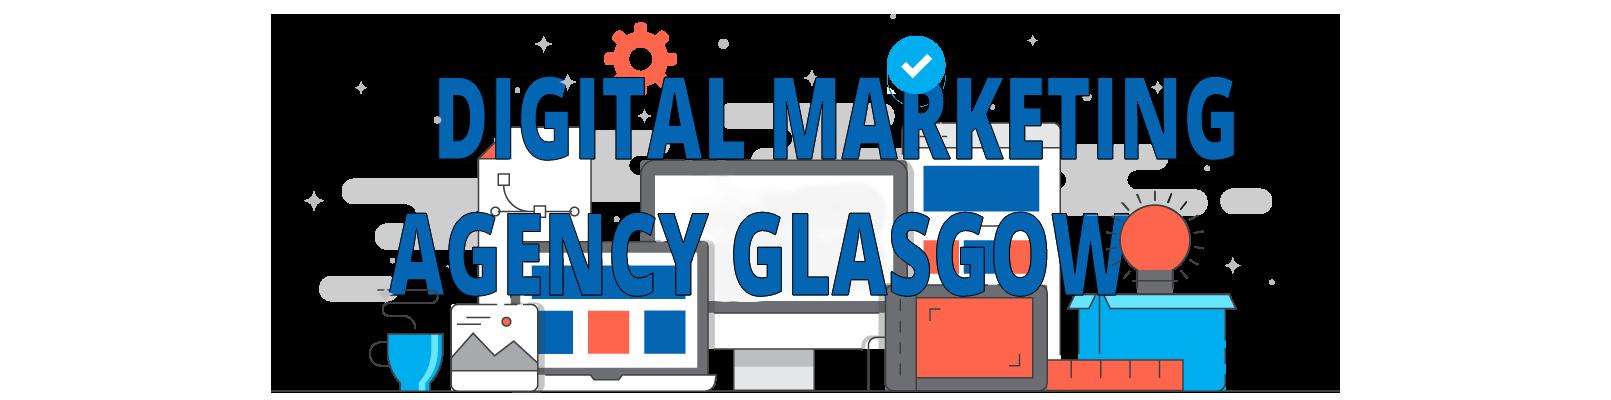 Digital-Marketing-Agency-Glasgow